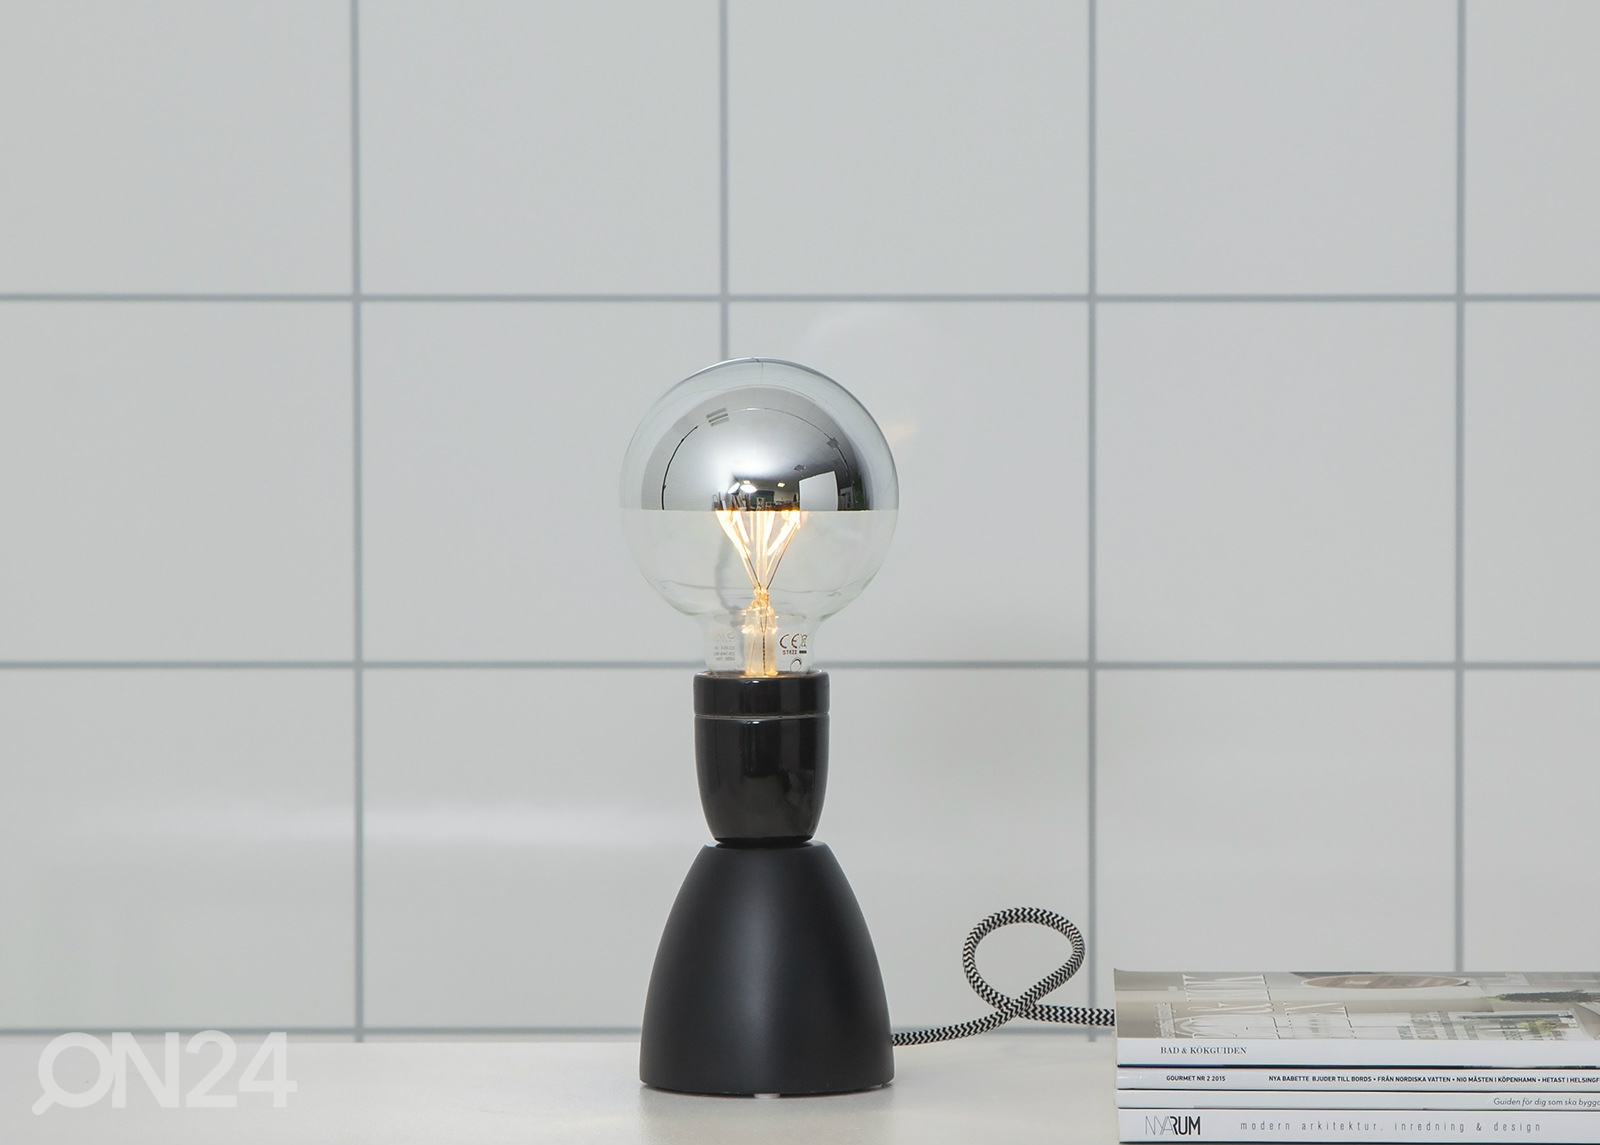 9bfd44e9e5e Dekoratiivne LED pirn E27 4 W AA-152808 - ON24 Sisustuskaubamaja